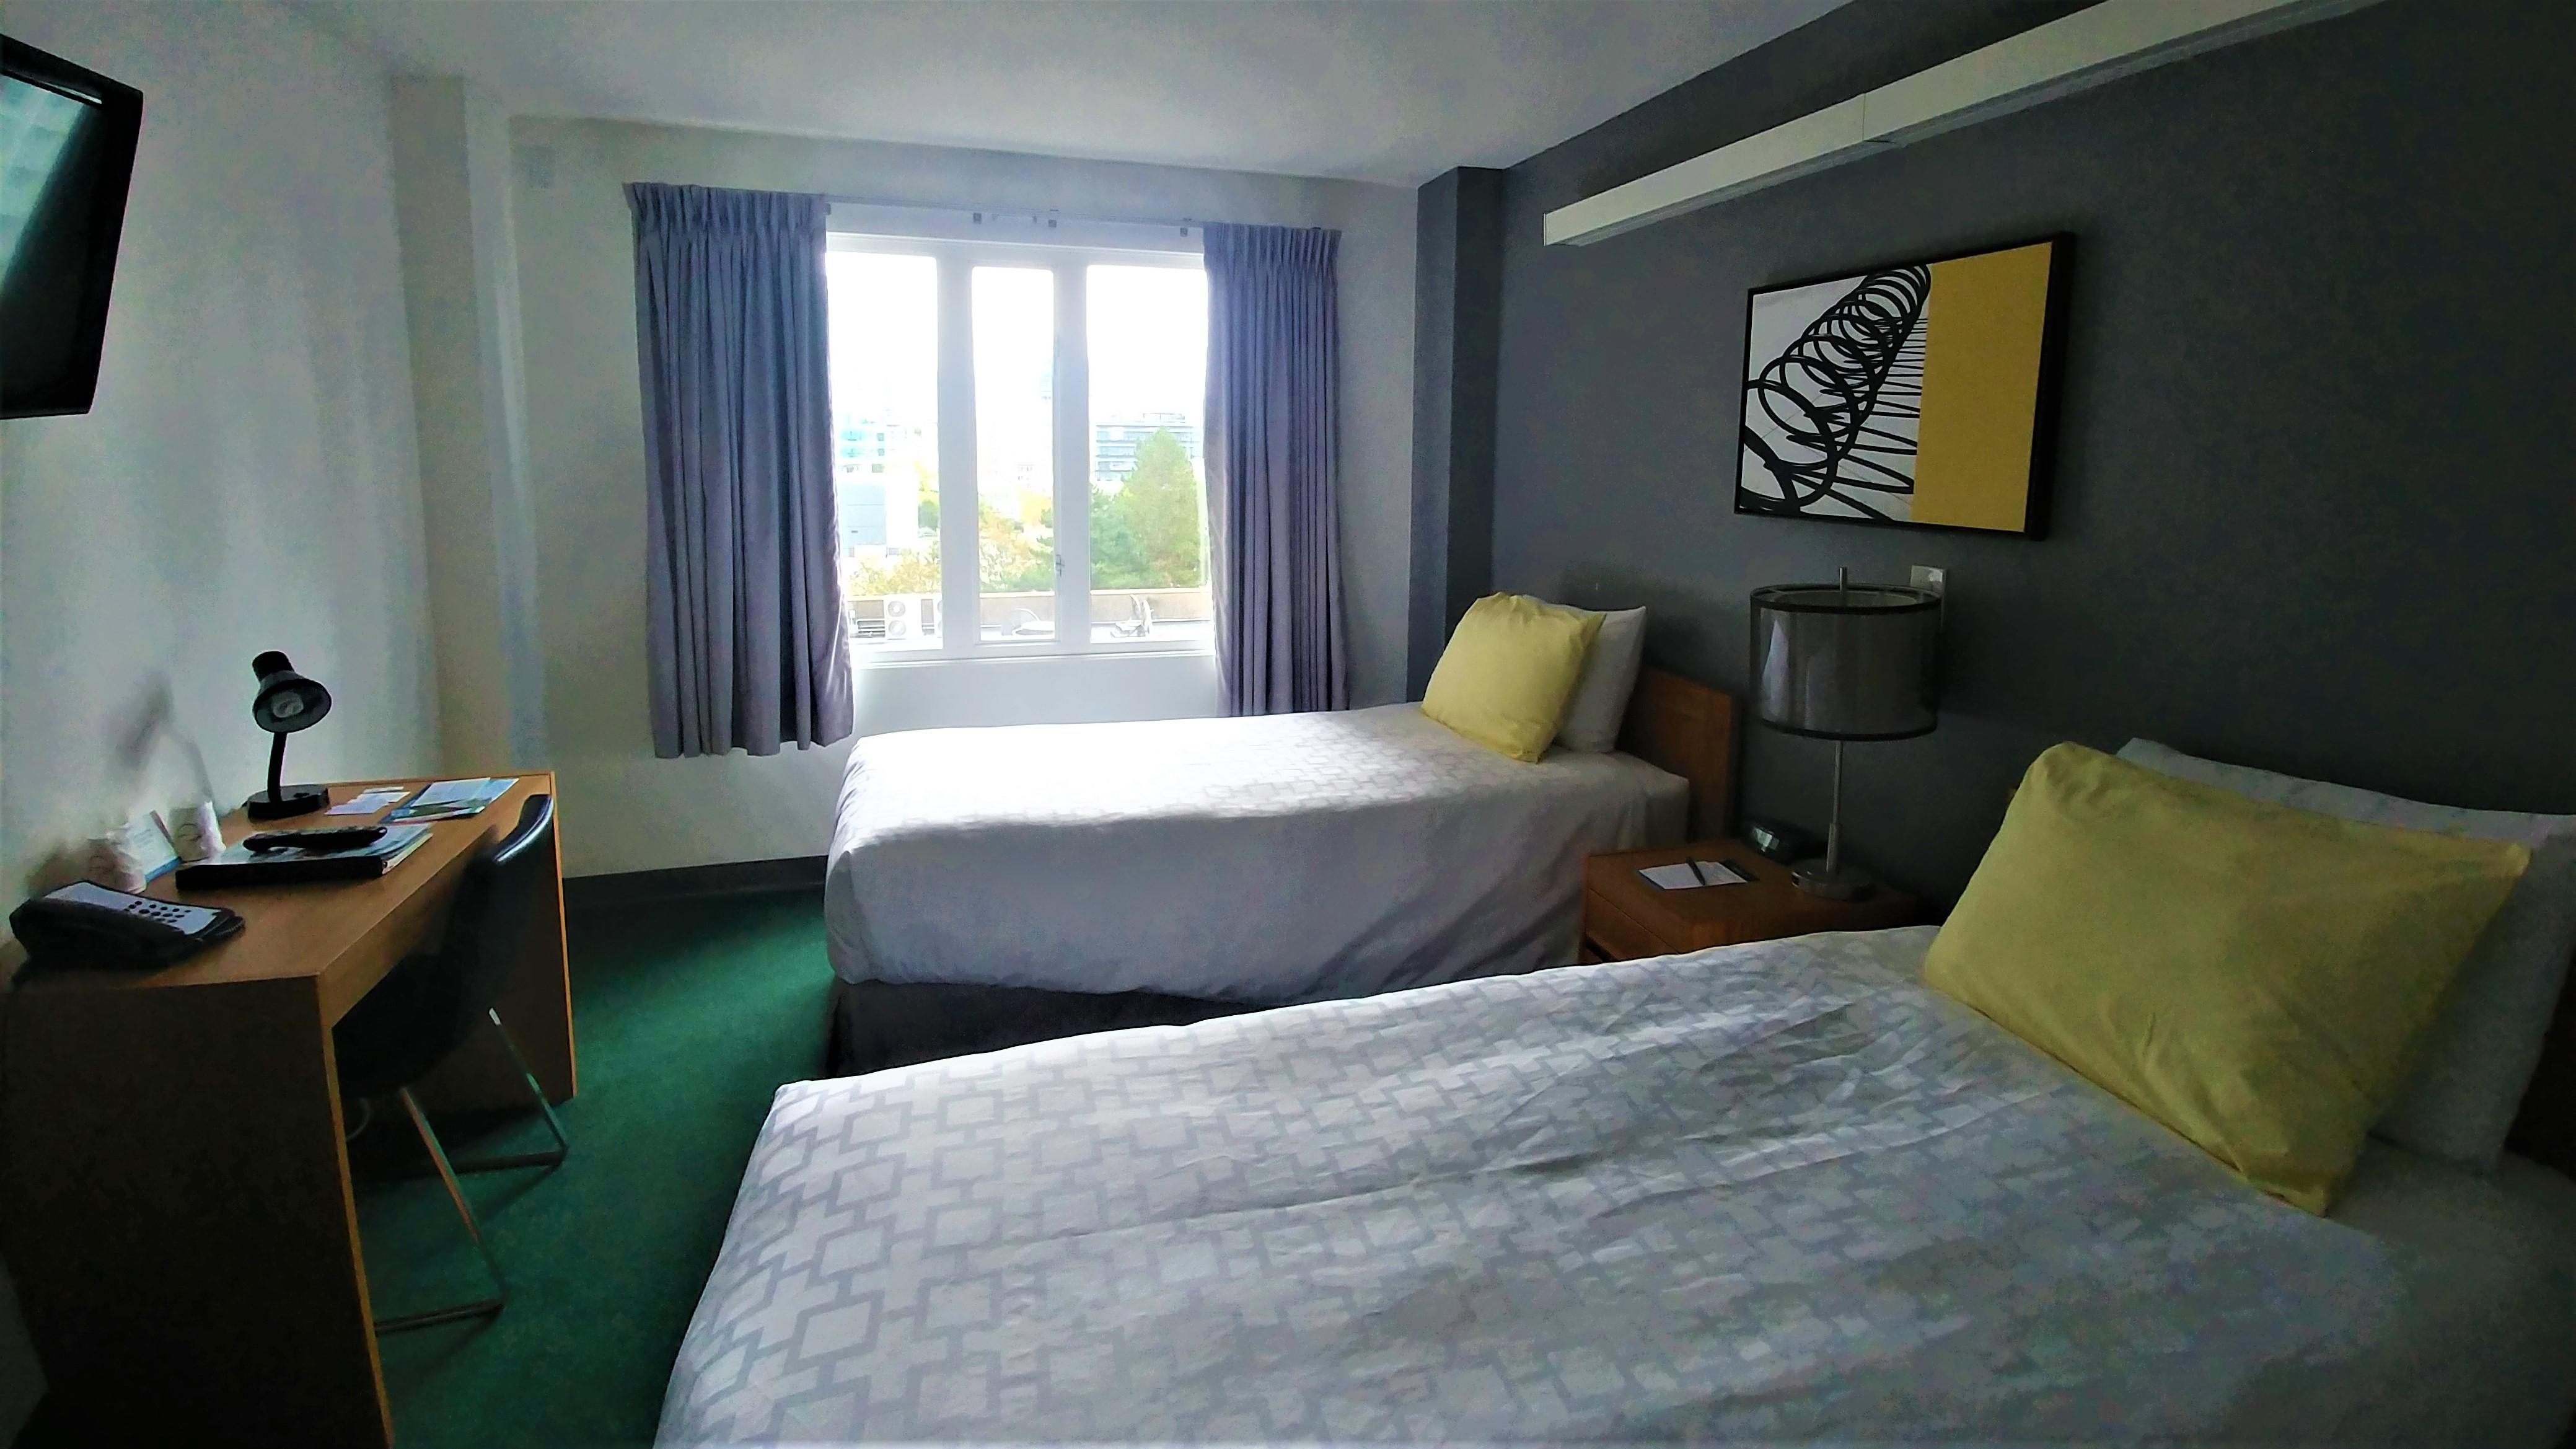 Vancouver ywca ou dormir hotel pas cher